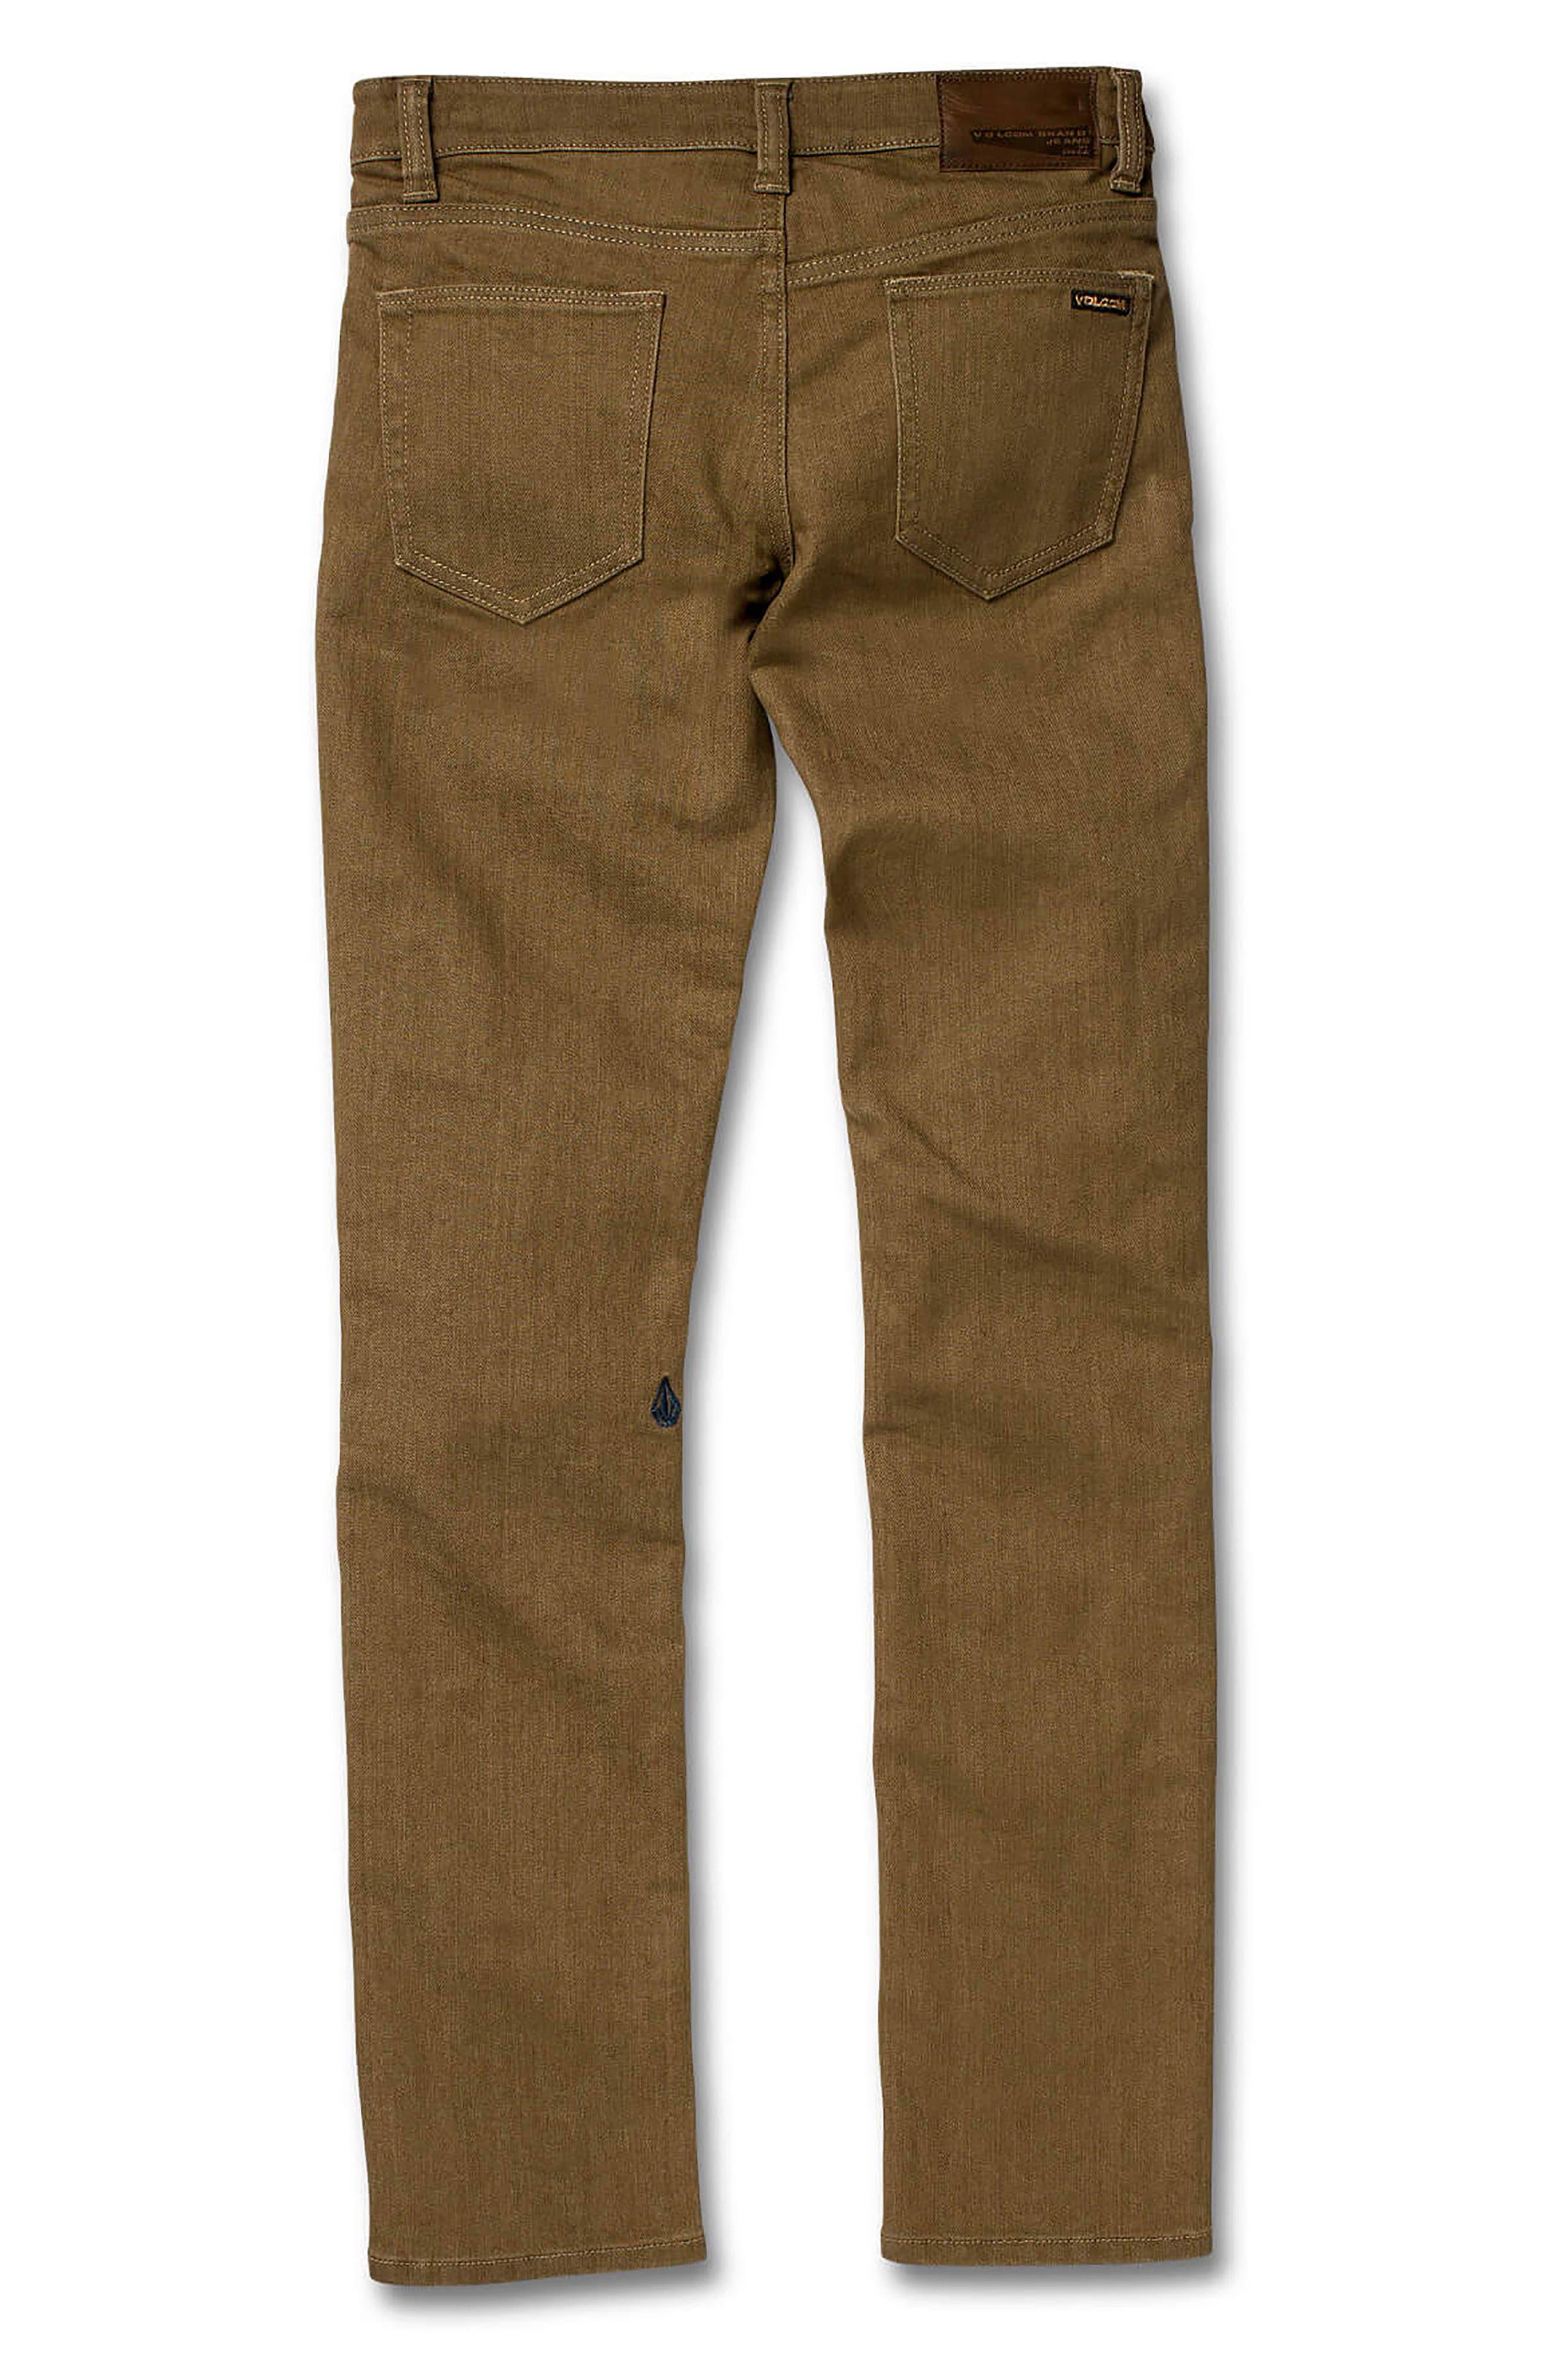 '2x4' Skinny Jeans,                             Alternate thumbnail 2, color,                             WET SAND